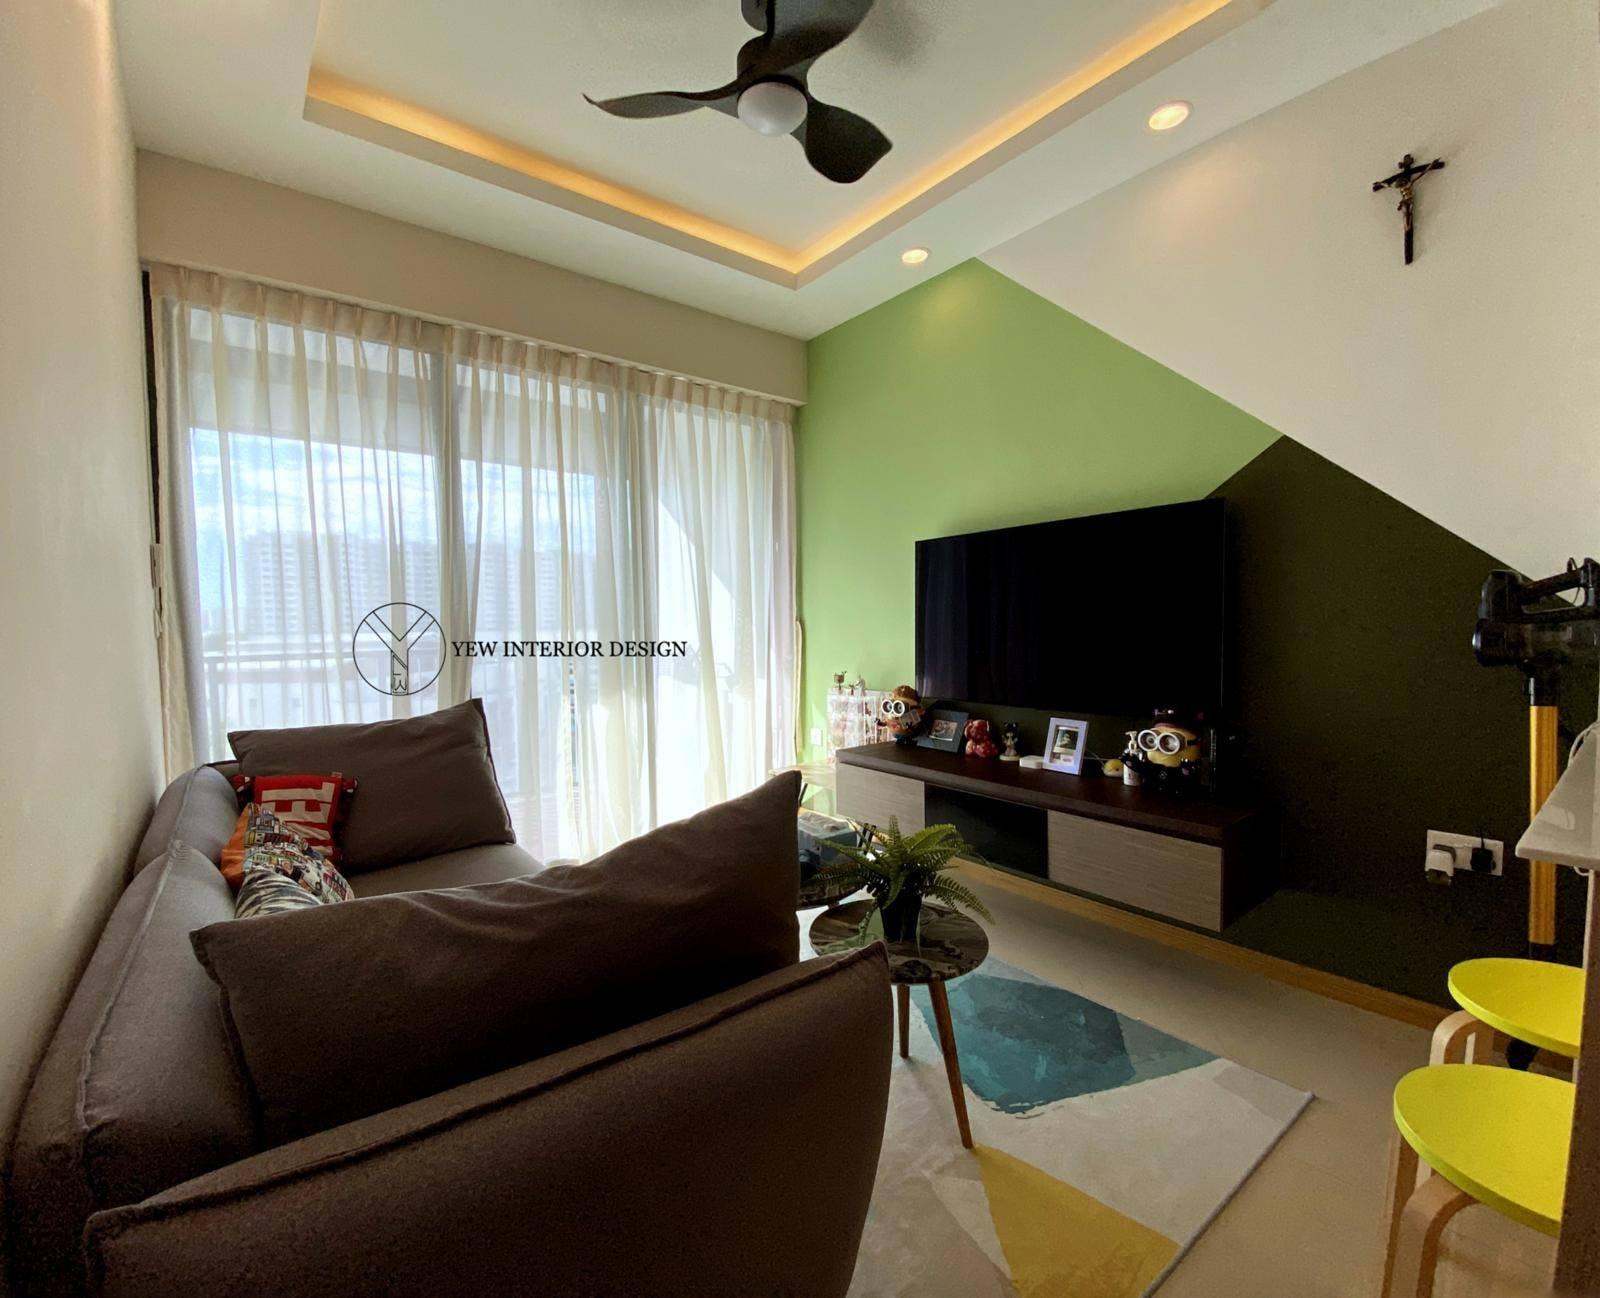 Yew Interior Design